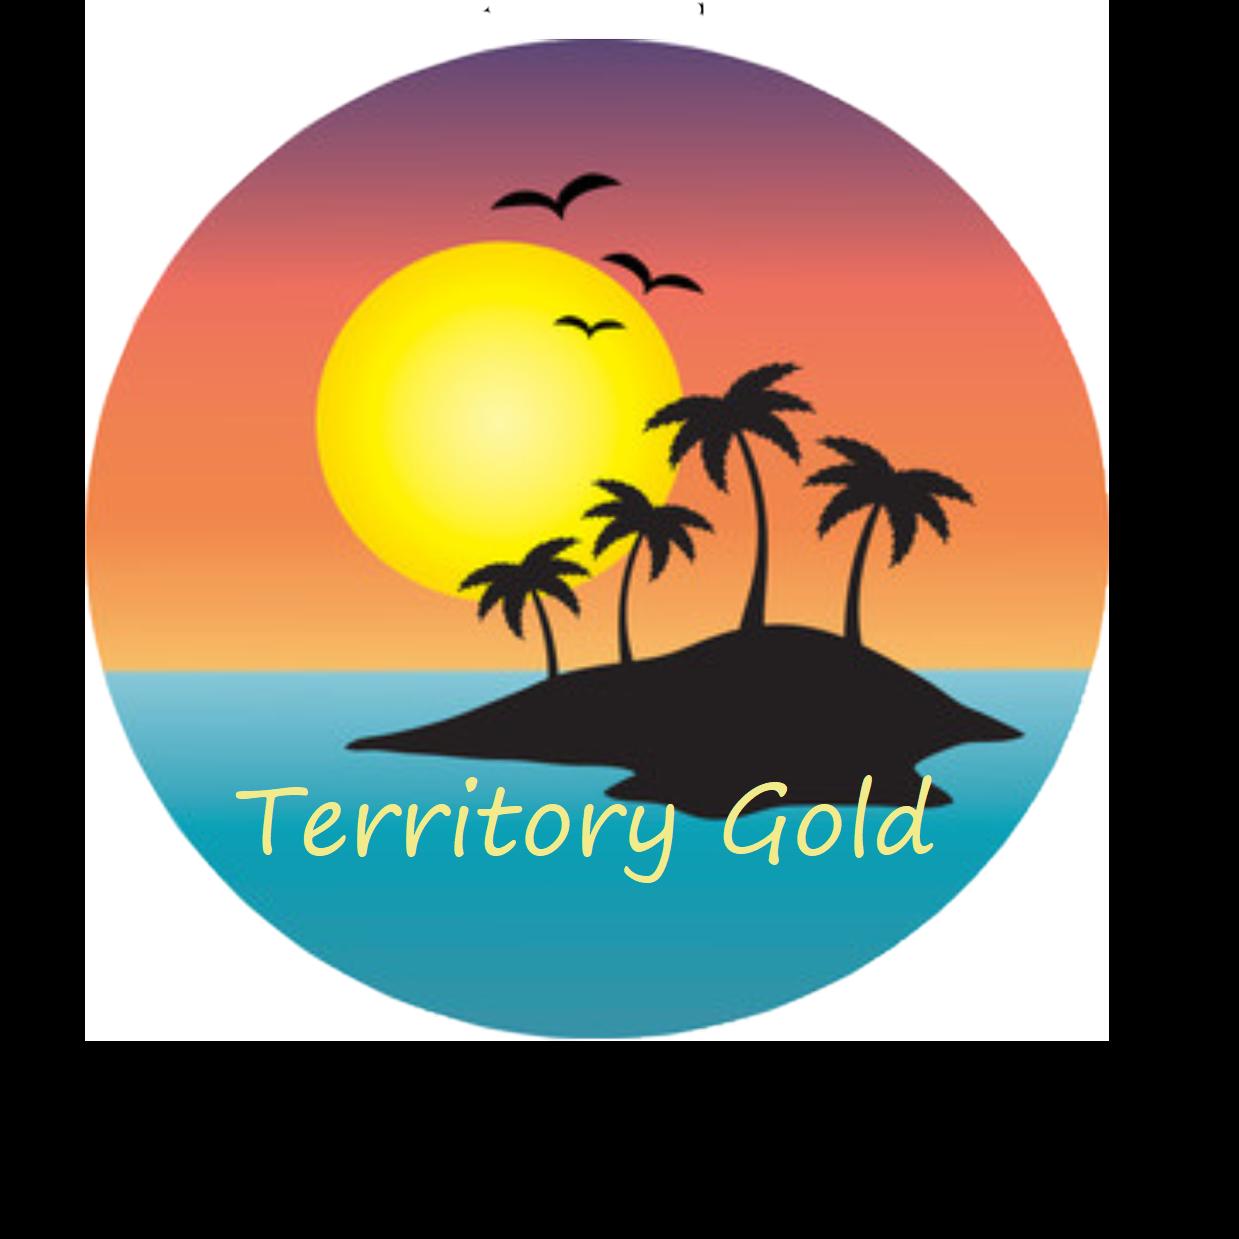 Territory Gold